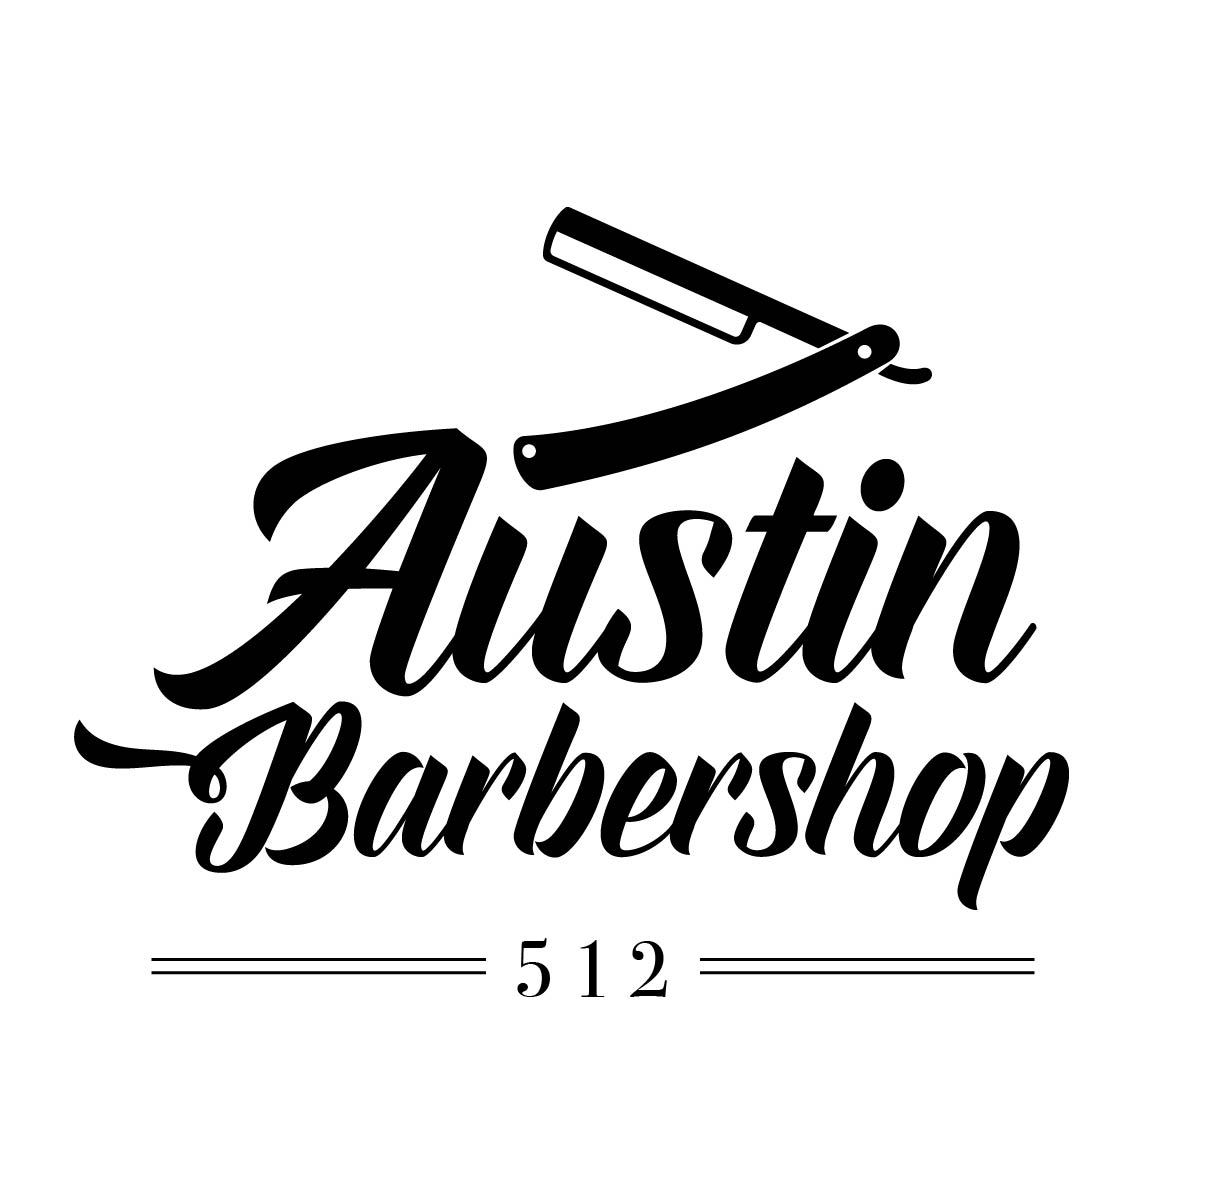 Austin_Barbeshop-03.jpg